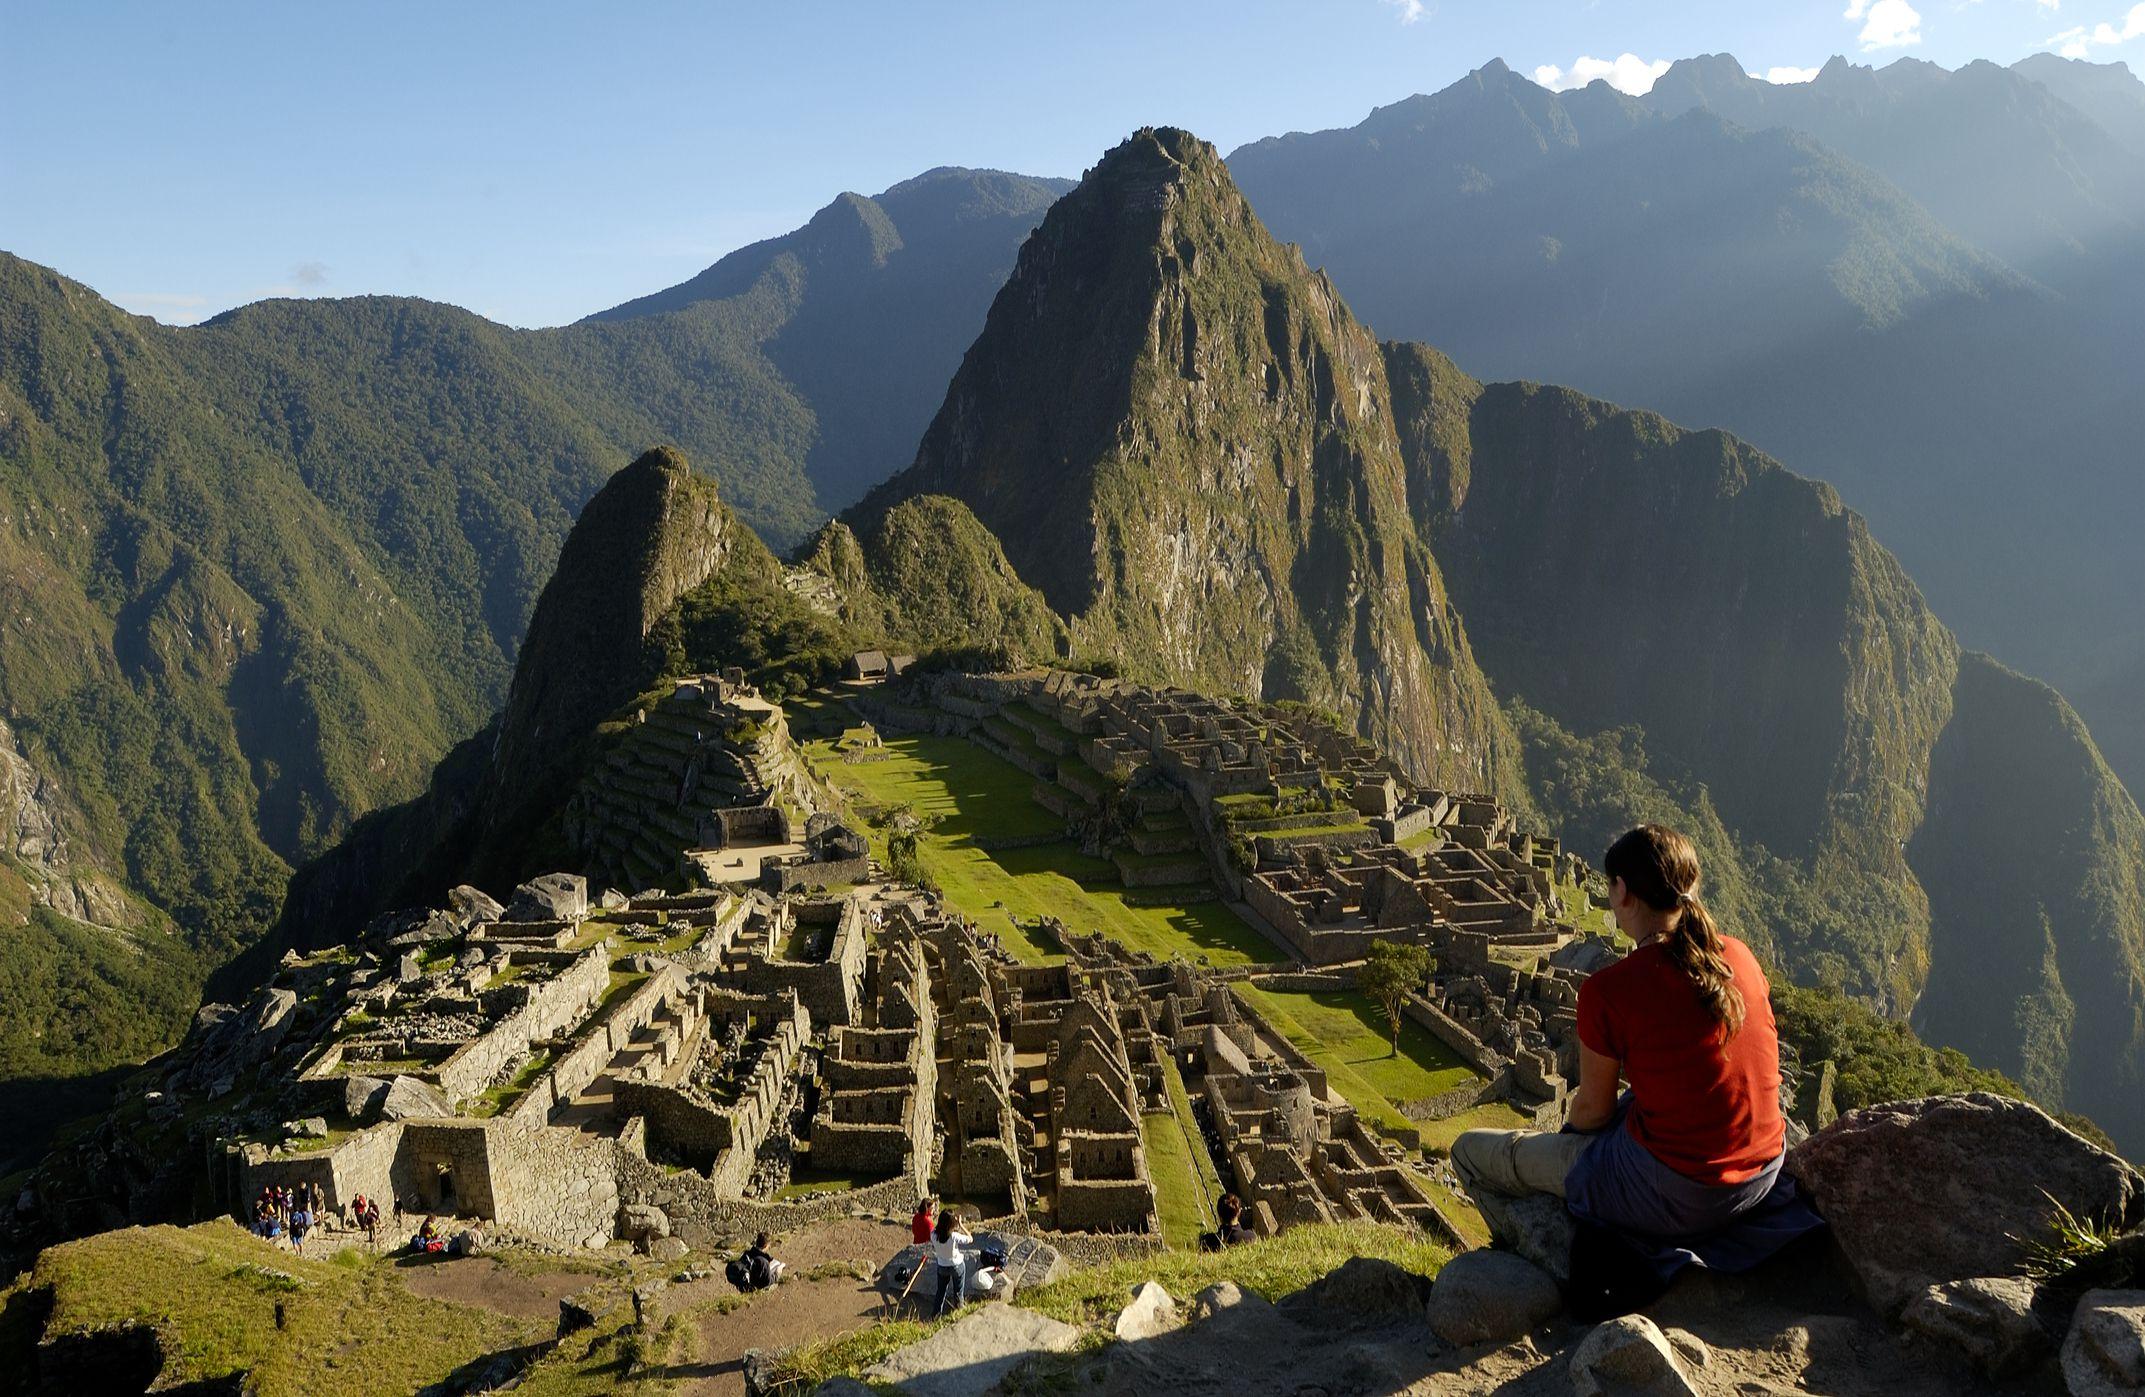 The 8 Best Machu Picchu Tours to Book in 2018